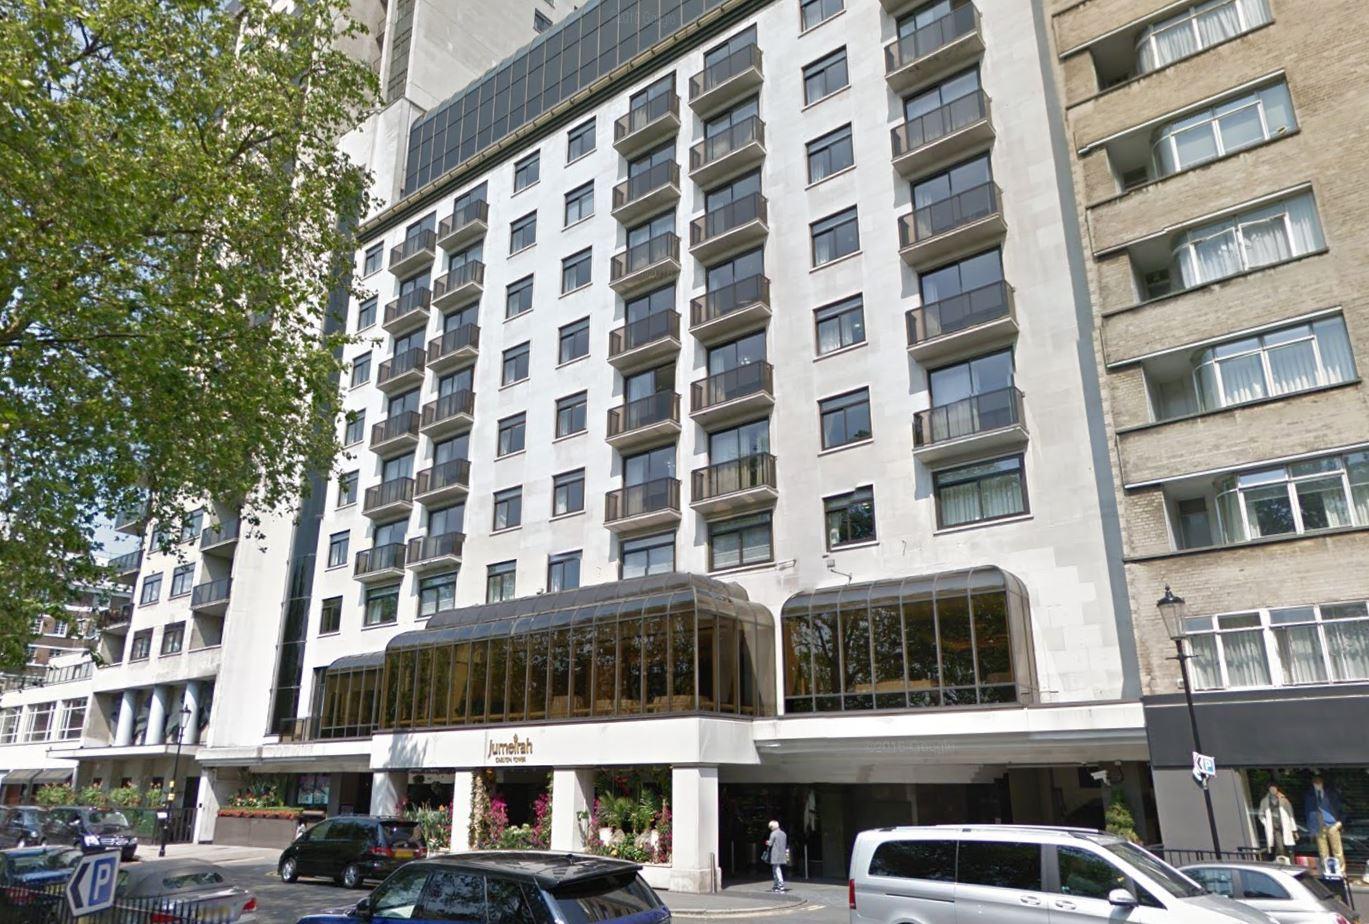 Jumeirah Carlton Tower Hotel Knightsbridge London